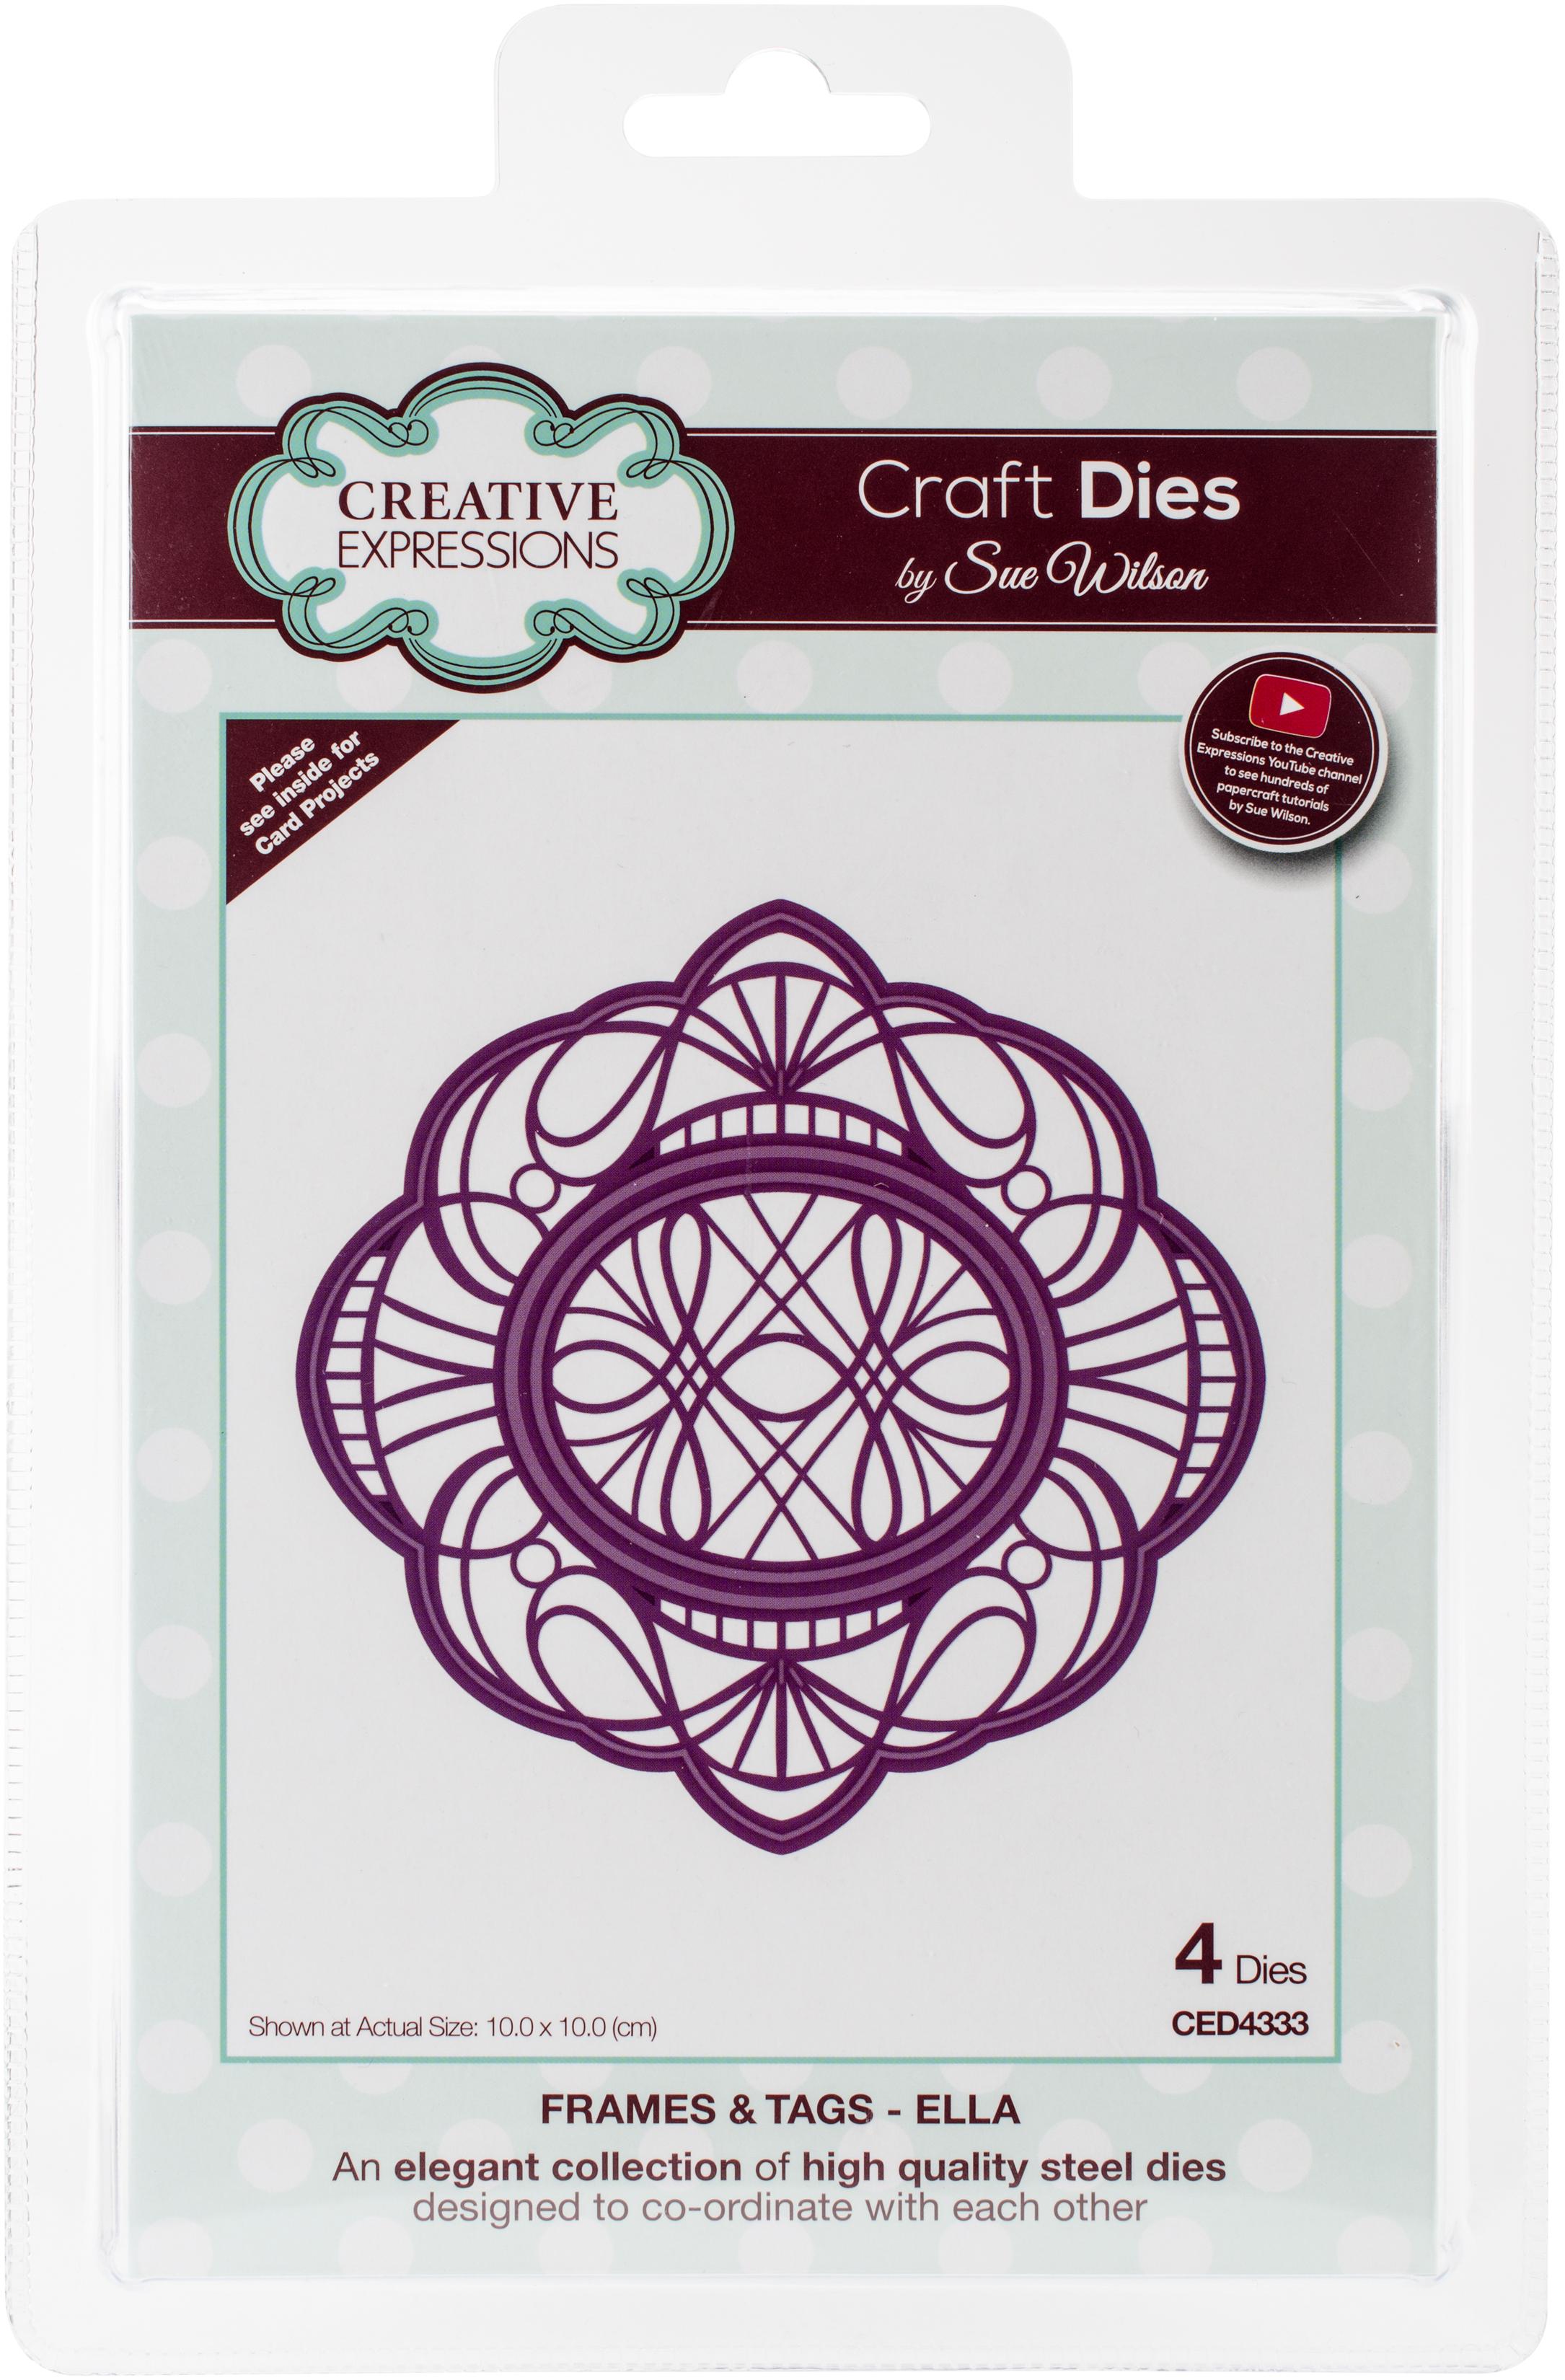 Creative Expressions Craft Dies By Sue Wilson-Frames & Tags-Ella 3.94X3.94